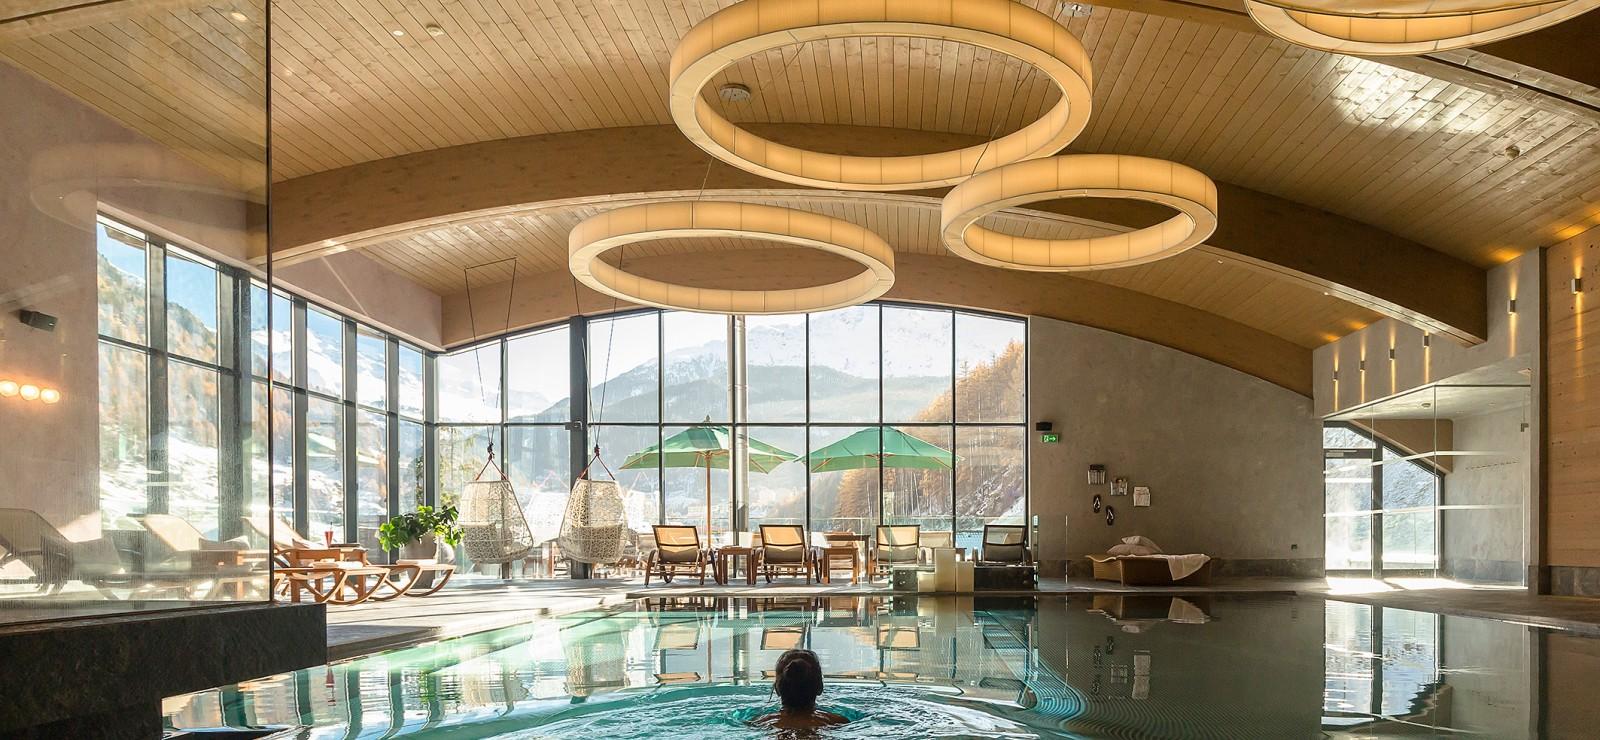 Bergland Hotel Sölden Bilder | Bild 1